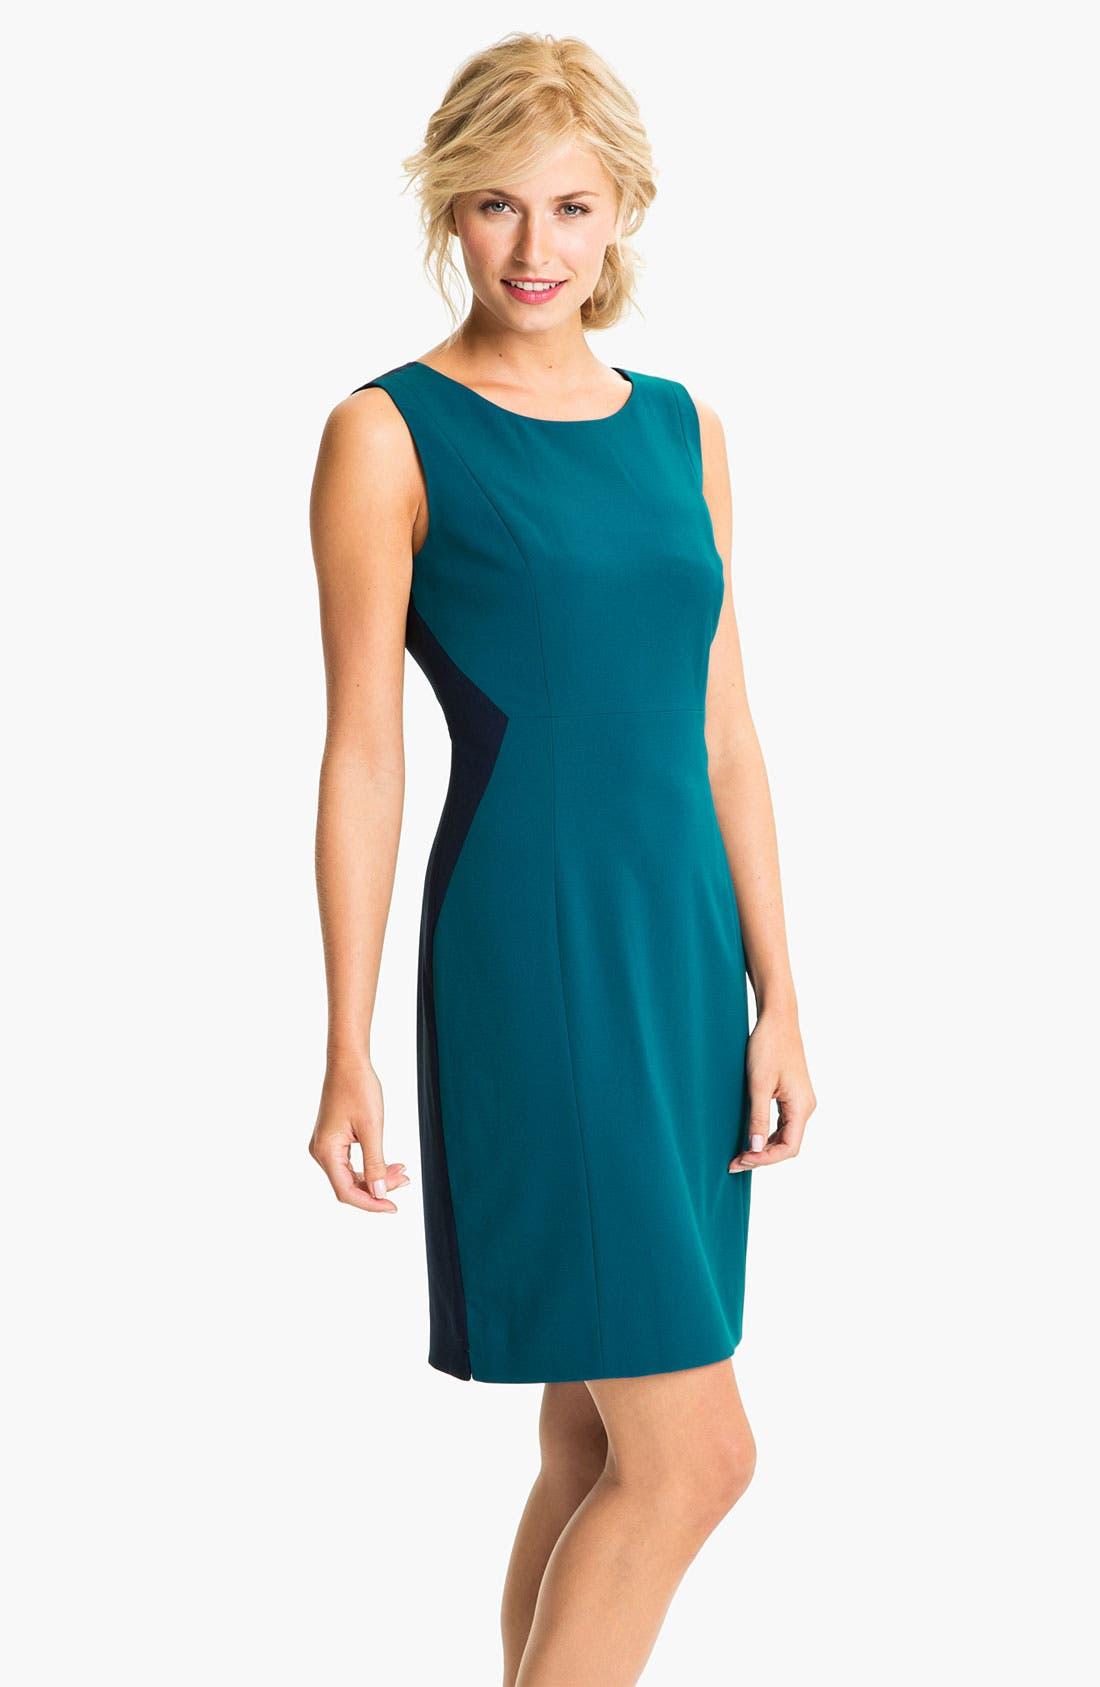 Alternate Image 1 Selected - Elie Tahari Exclusive for Nordstrom 'Estelle' Dress